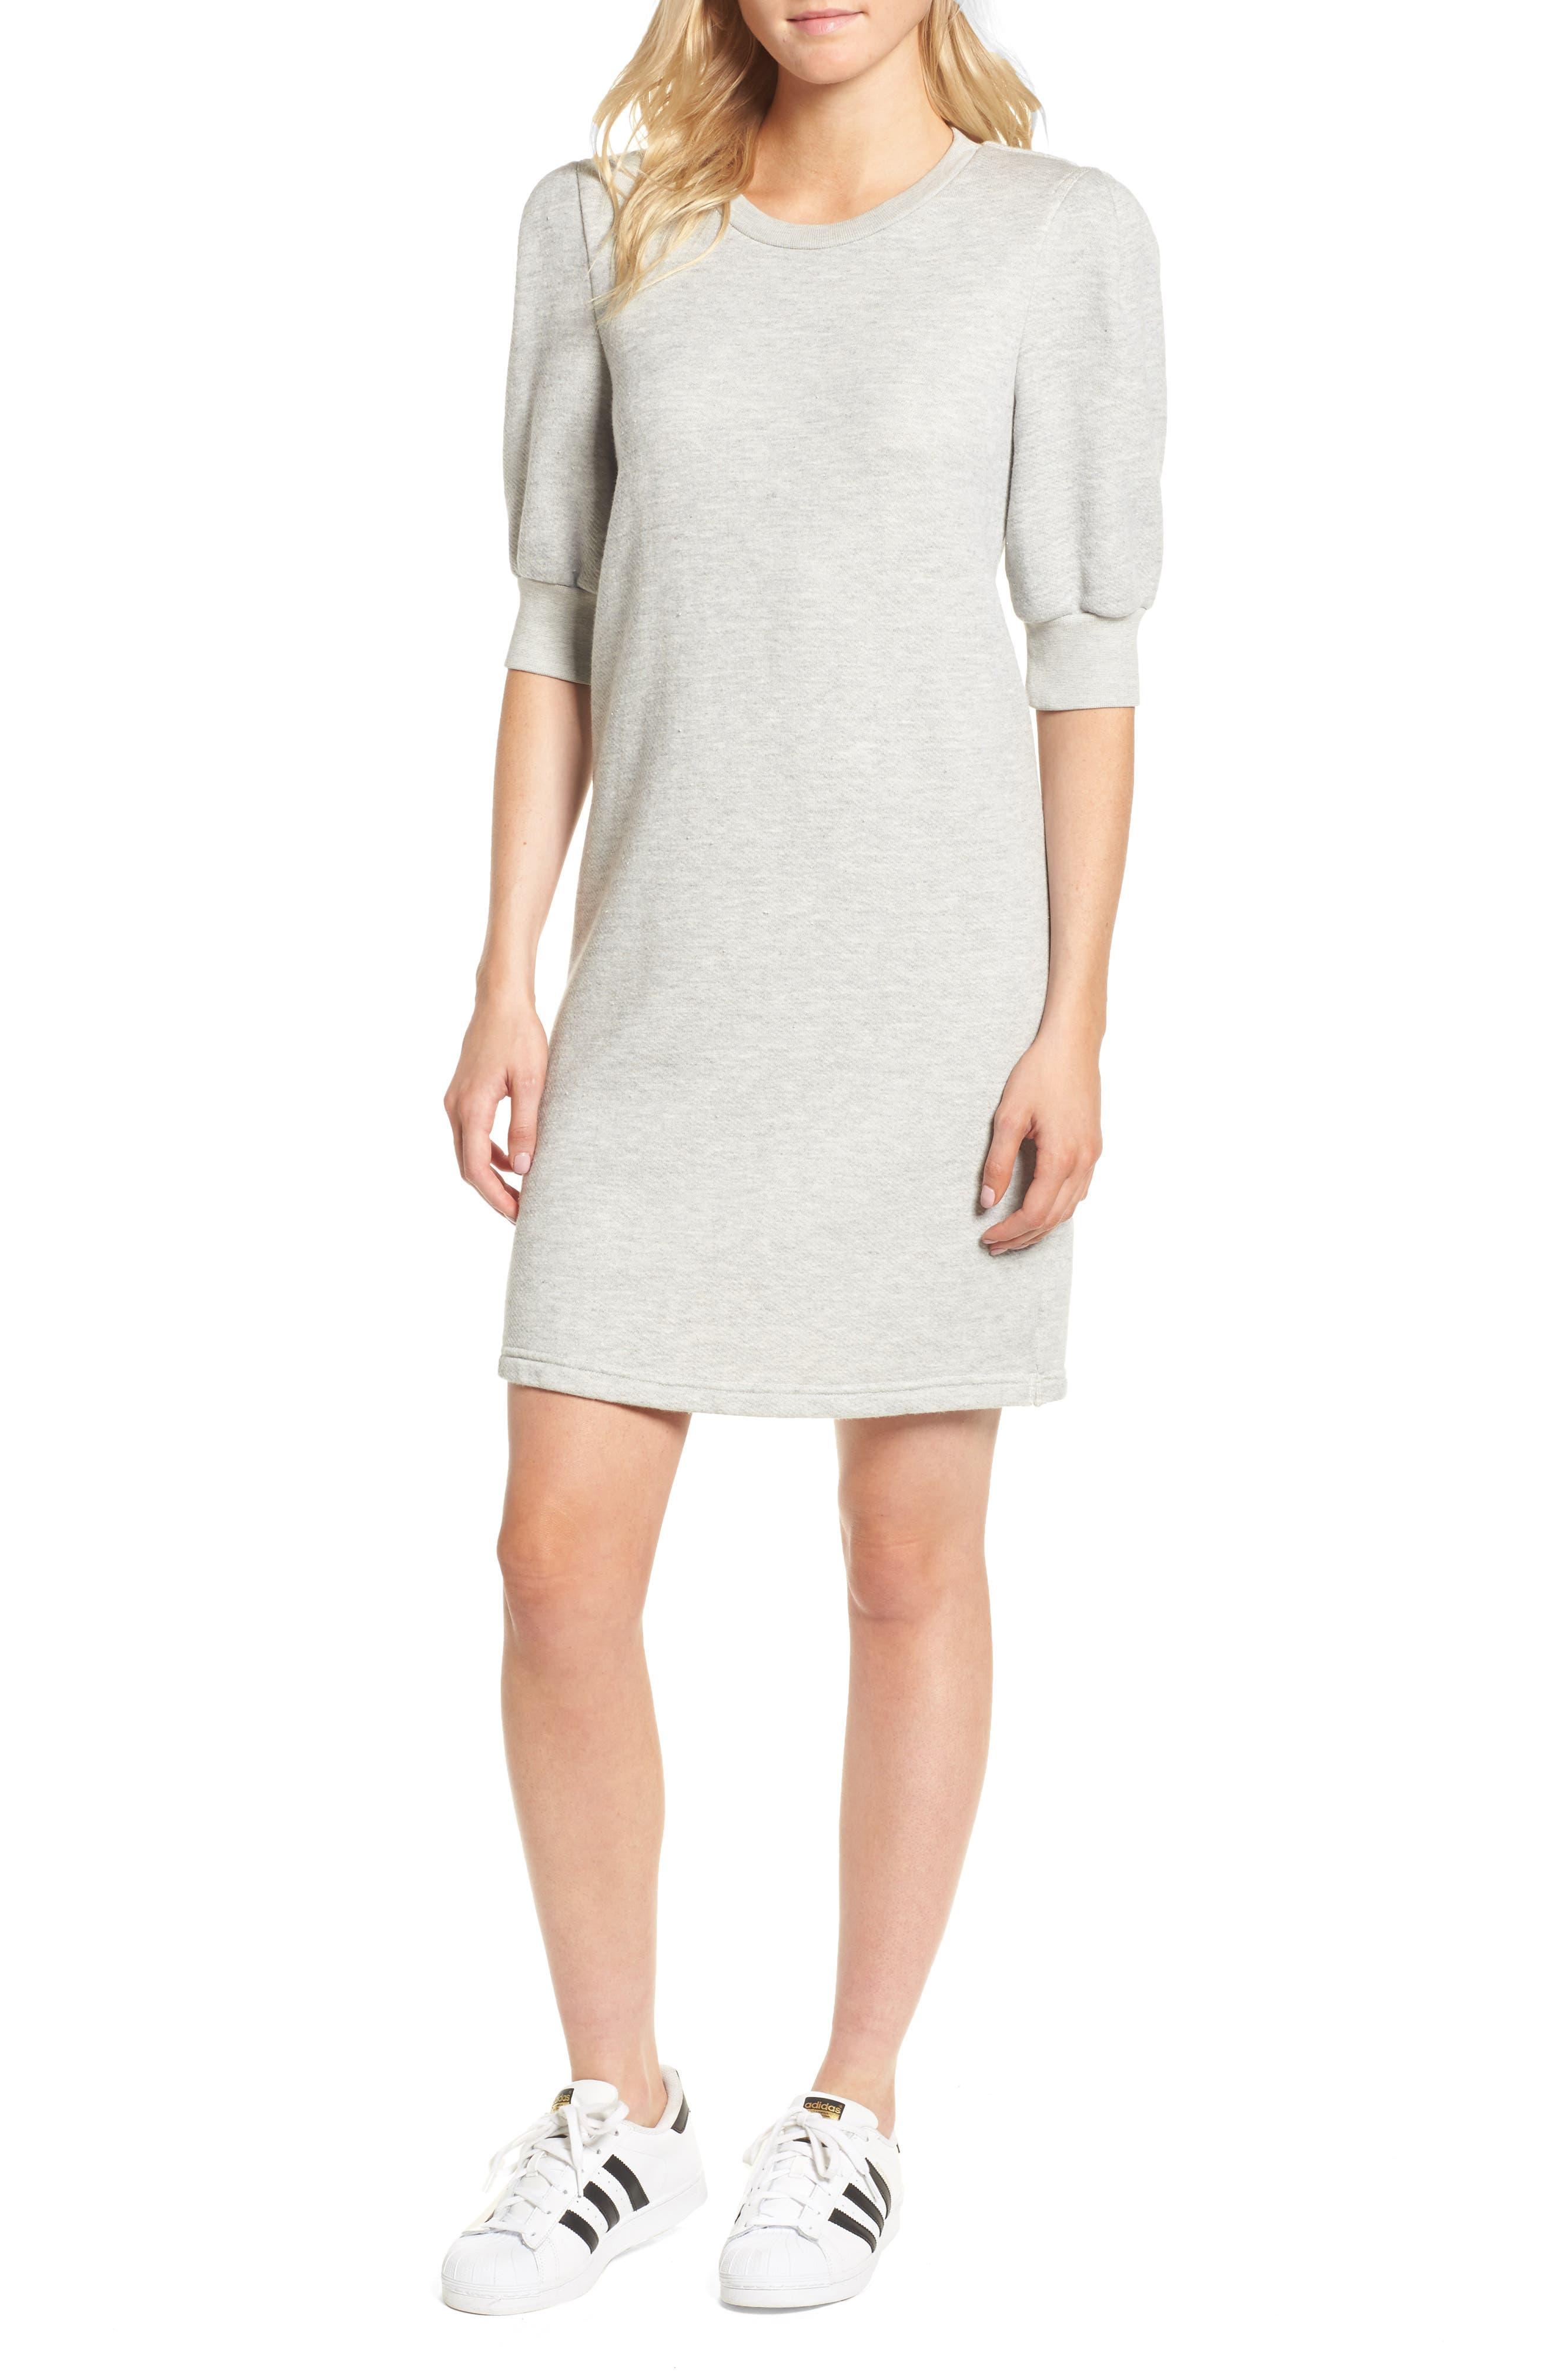 The Pleat Sweatshirt Dress,                             Main thumbnail 1, color,                             Light Heather Grey Terry